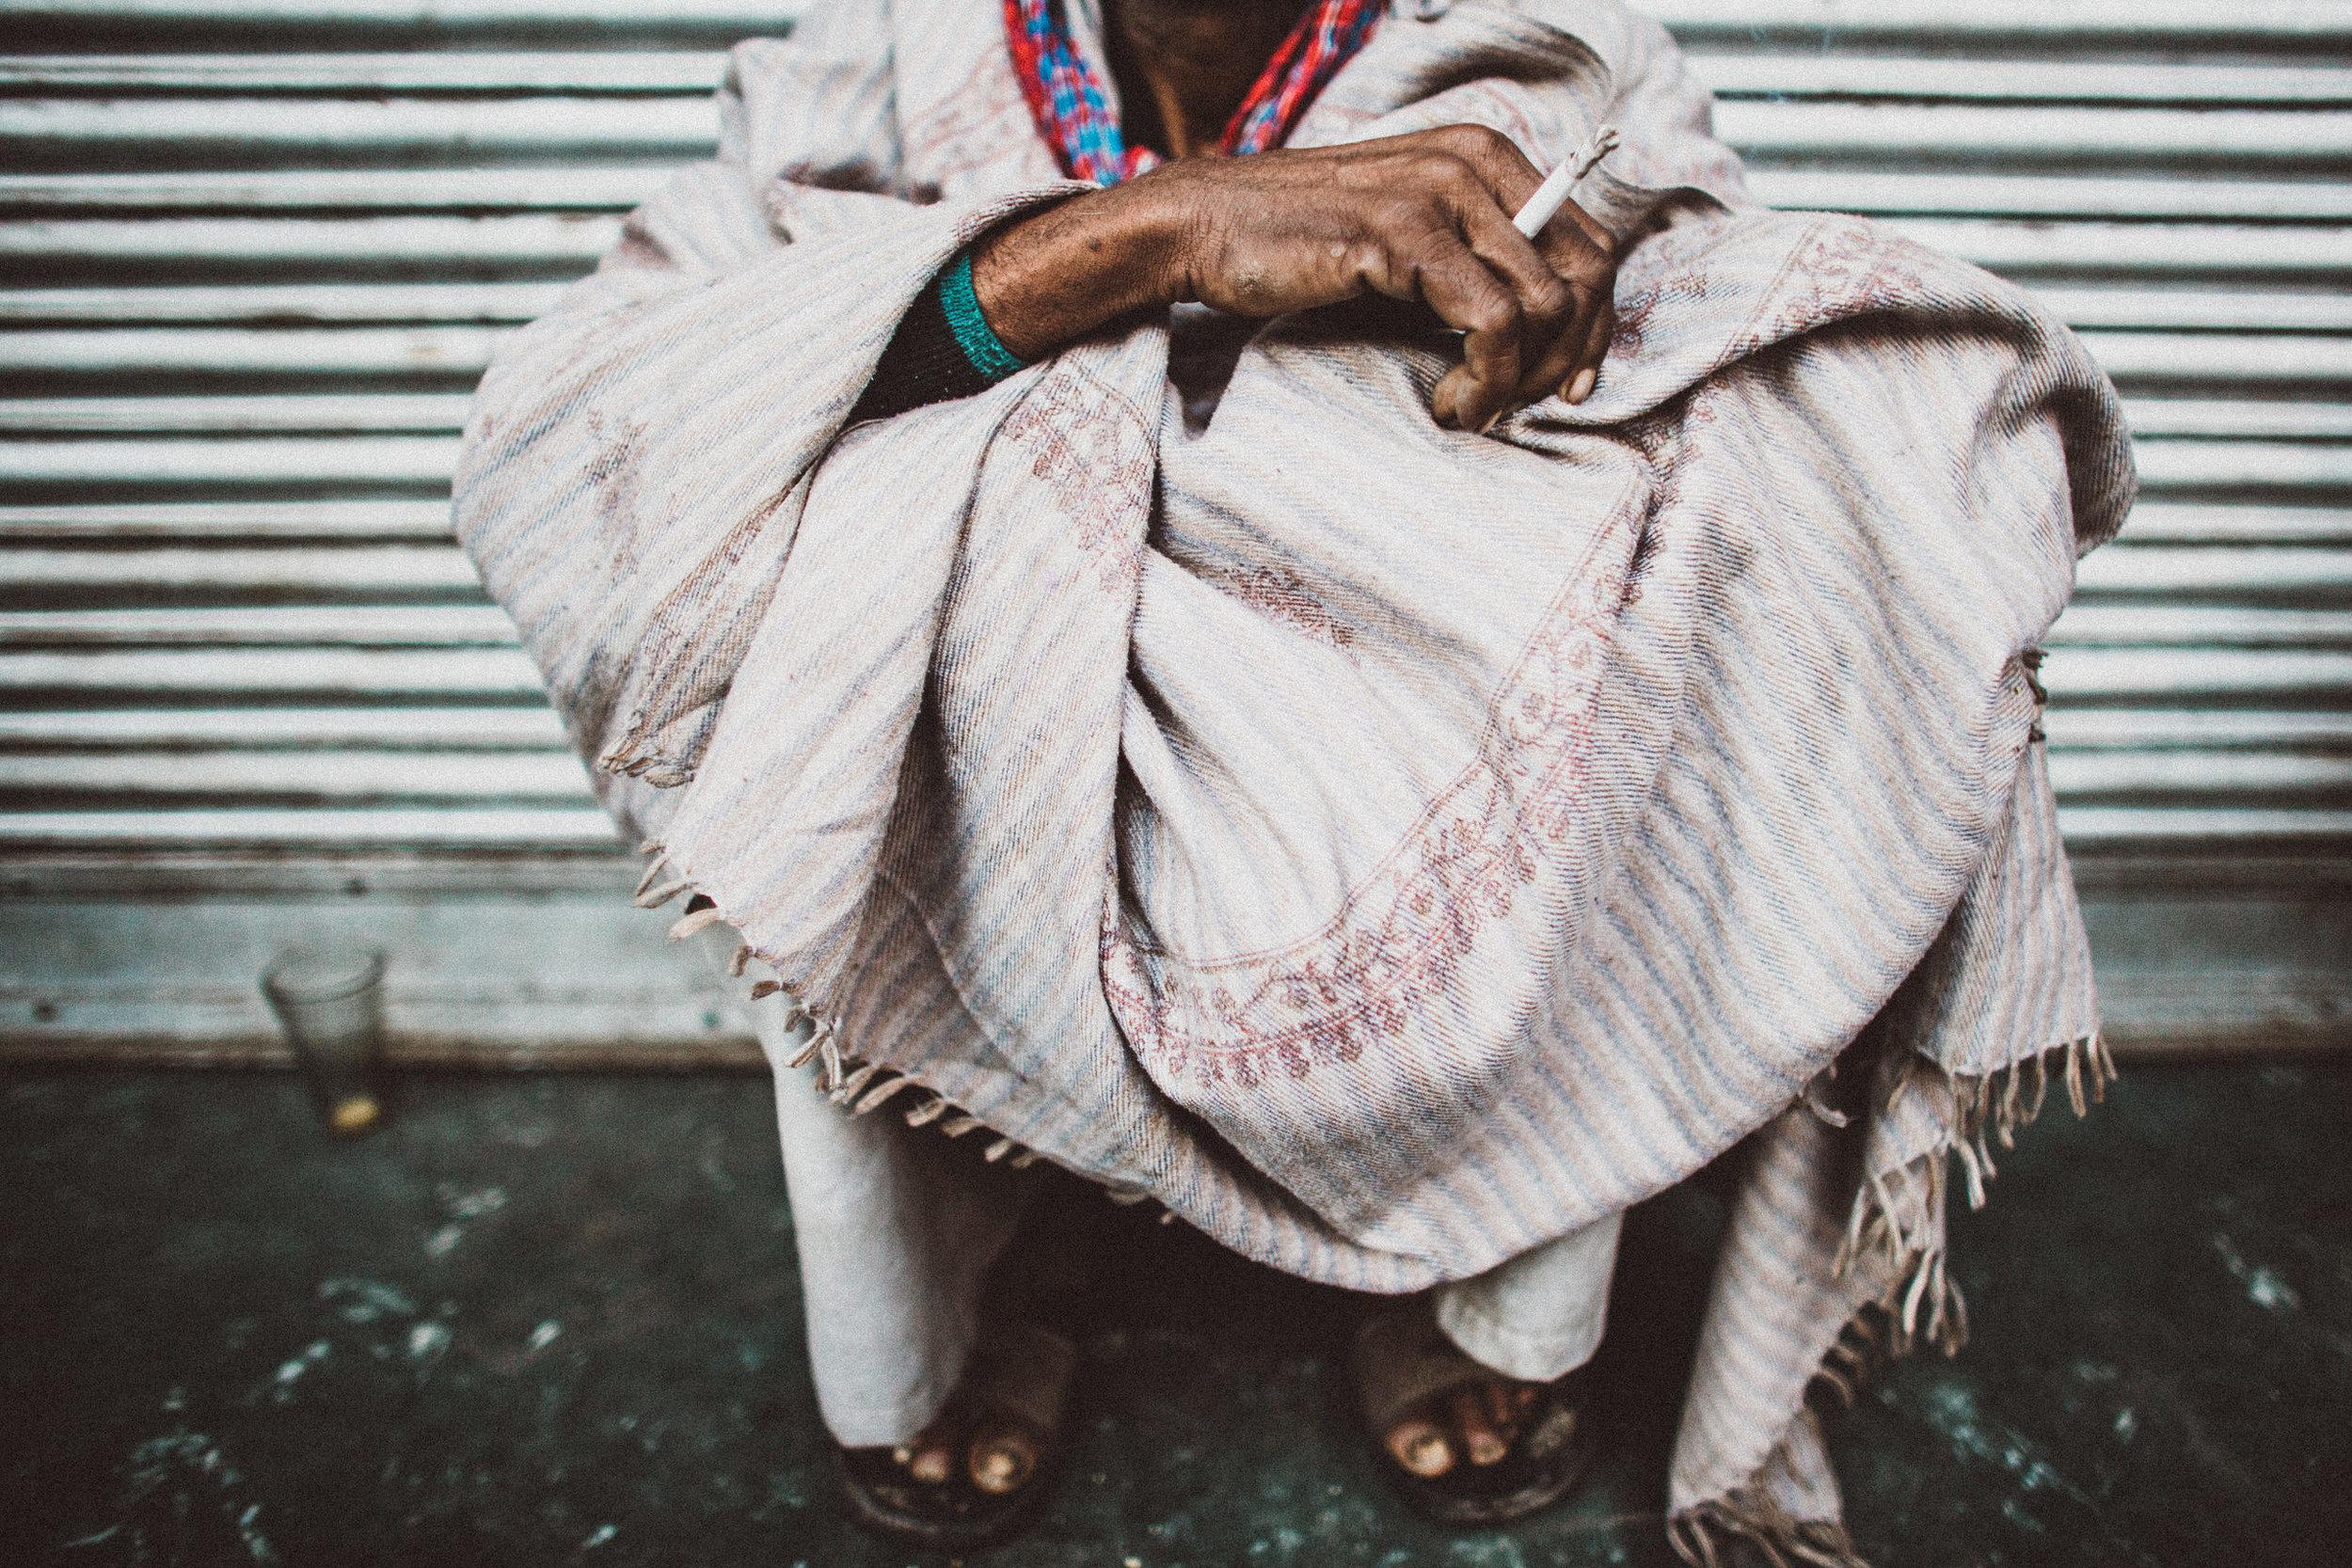 AFFOB_INDIA_20151111.JPG